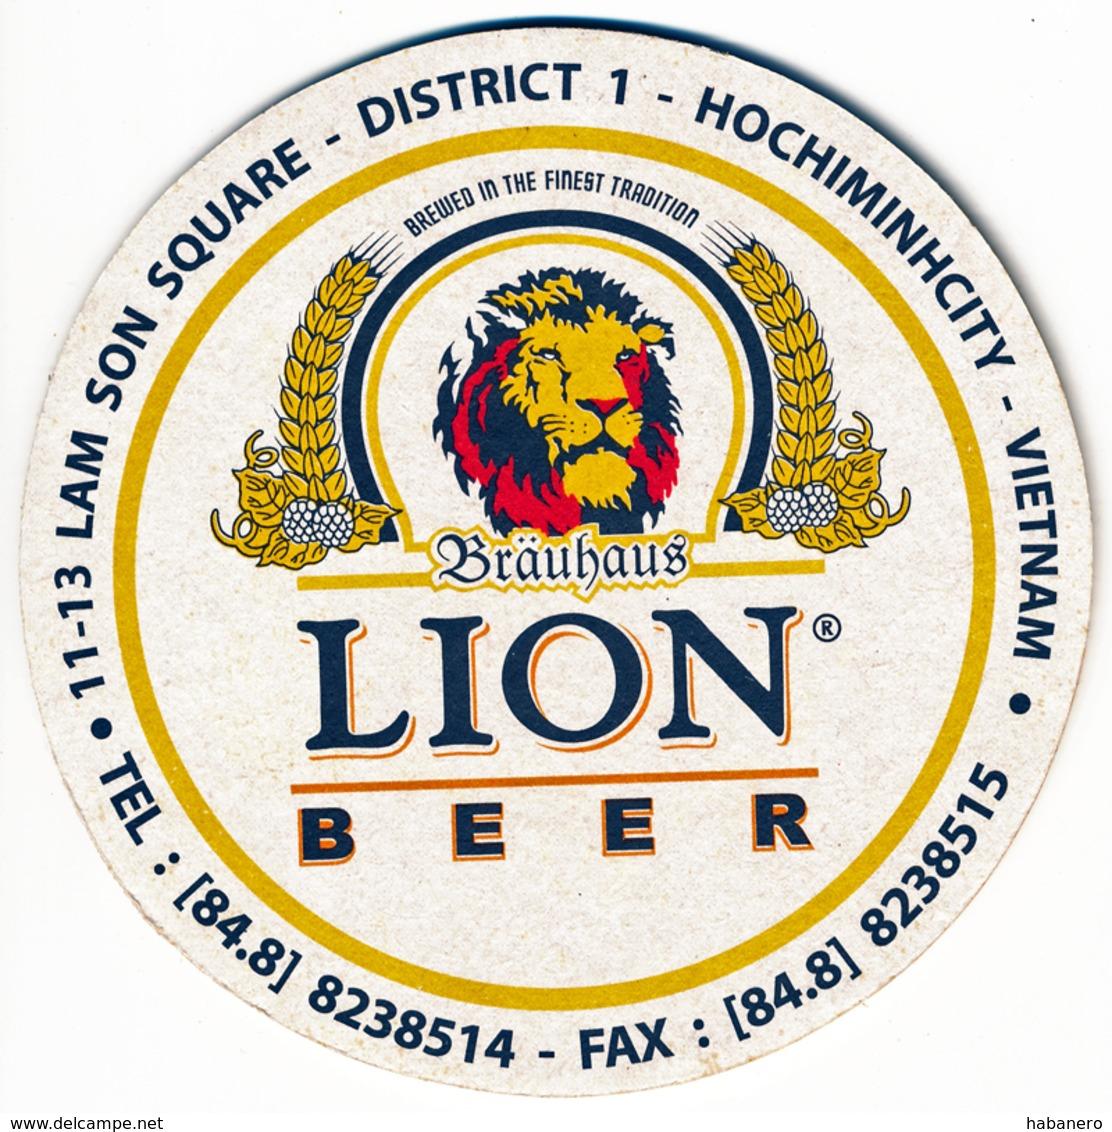 VIETNAM - LION BEER - CRAFT BEER FROM HO CHI MINH (SAIGON) - Beer Mats